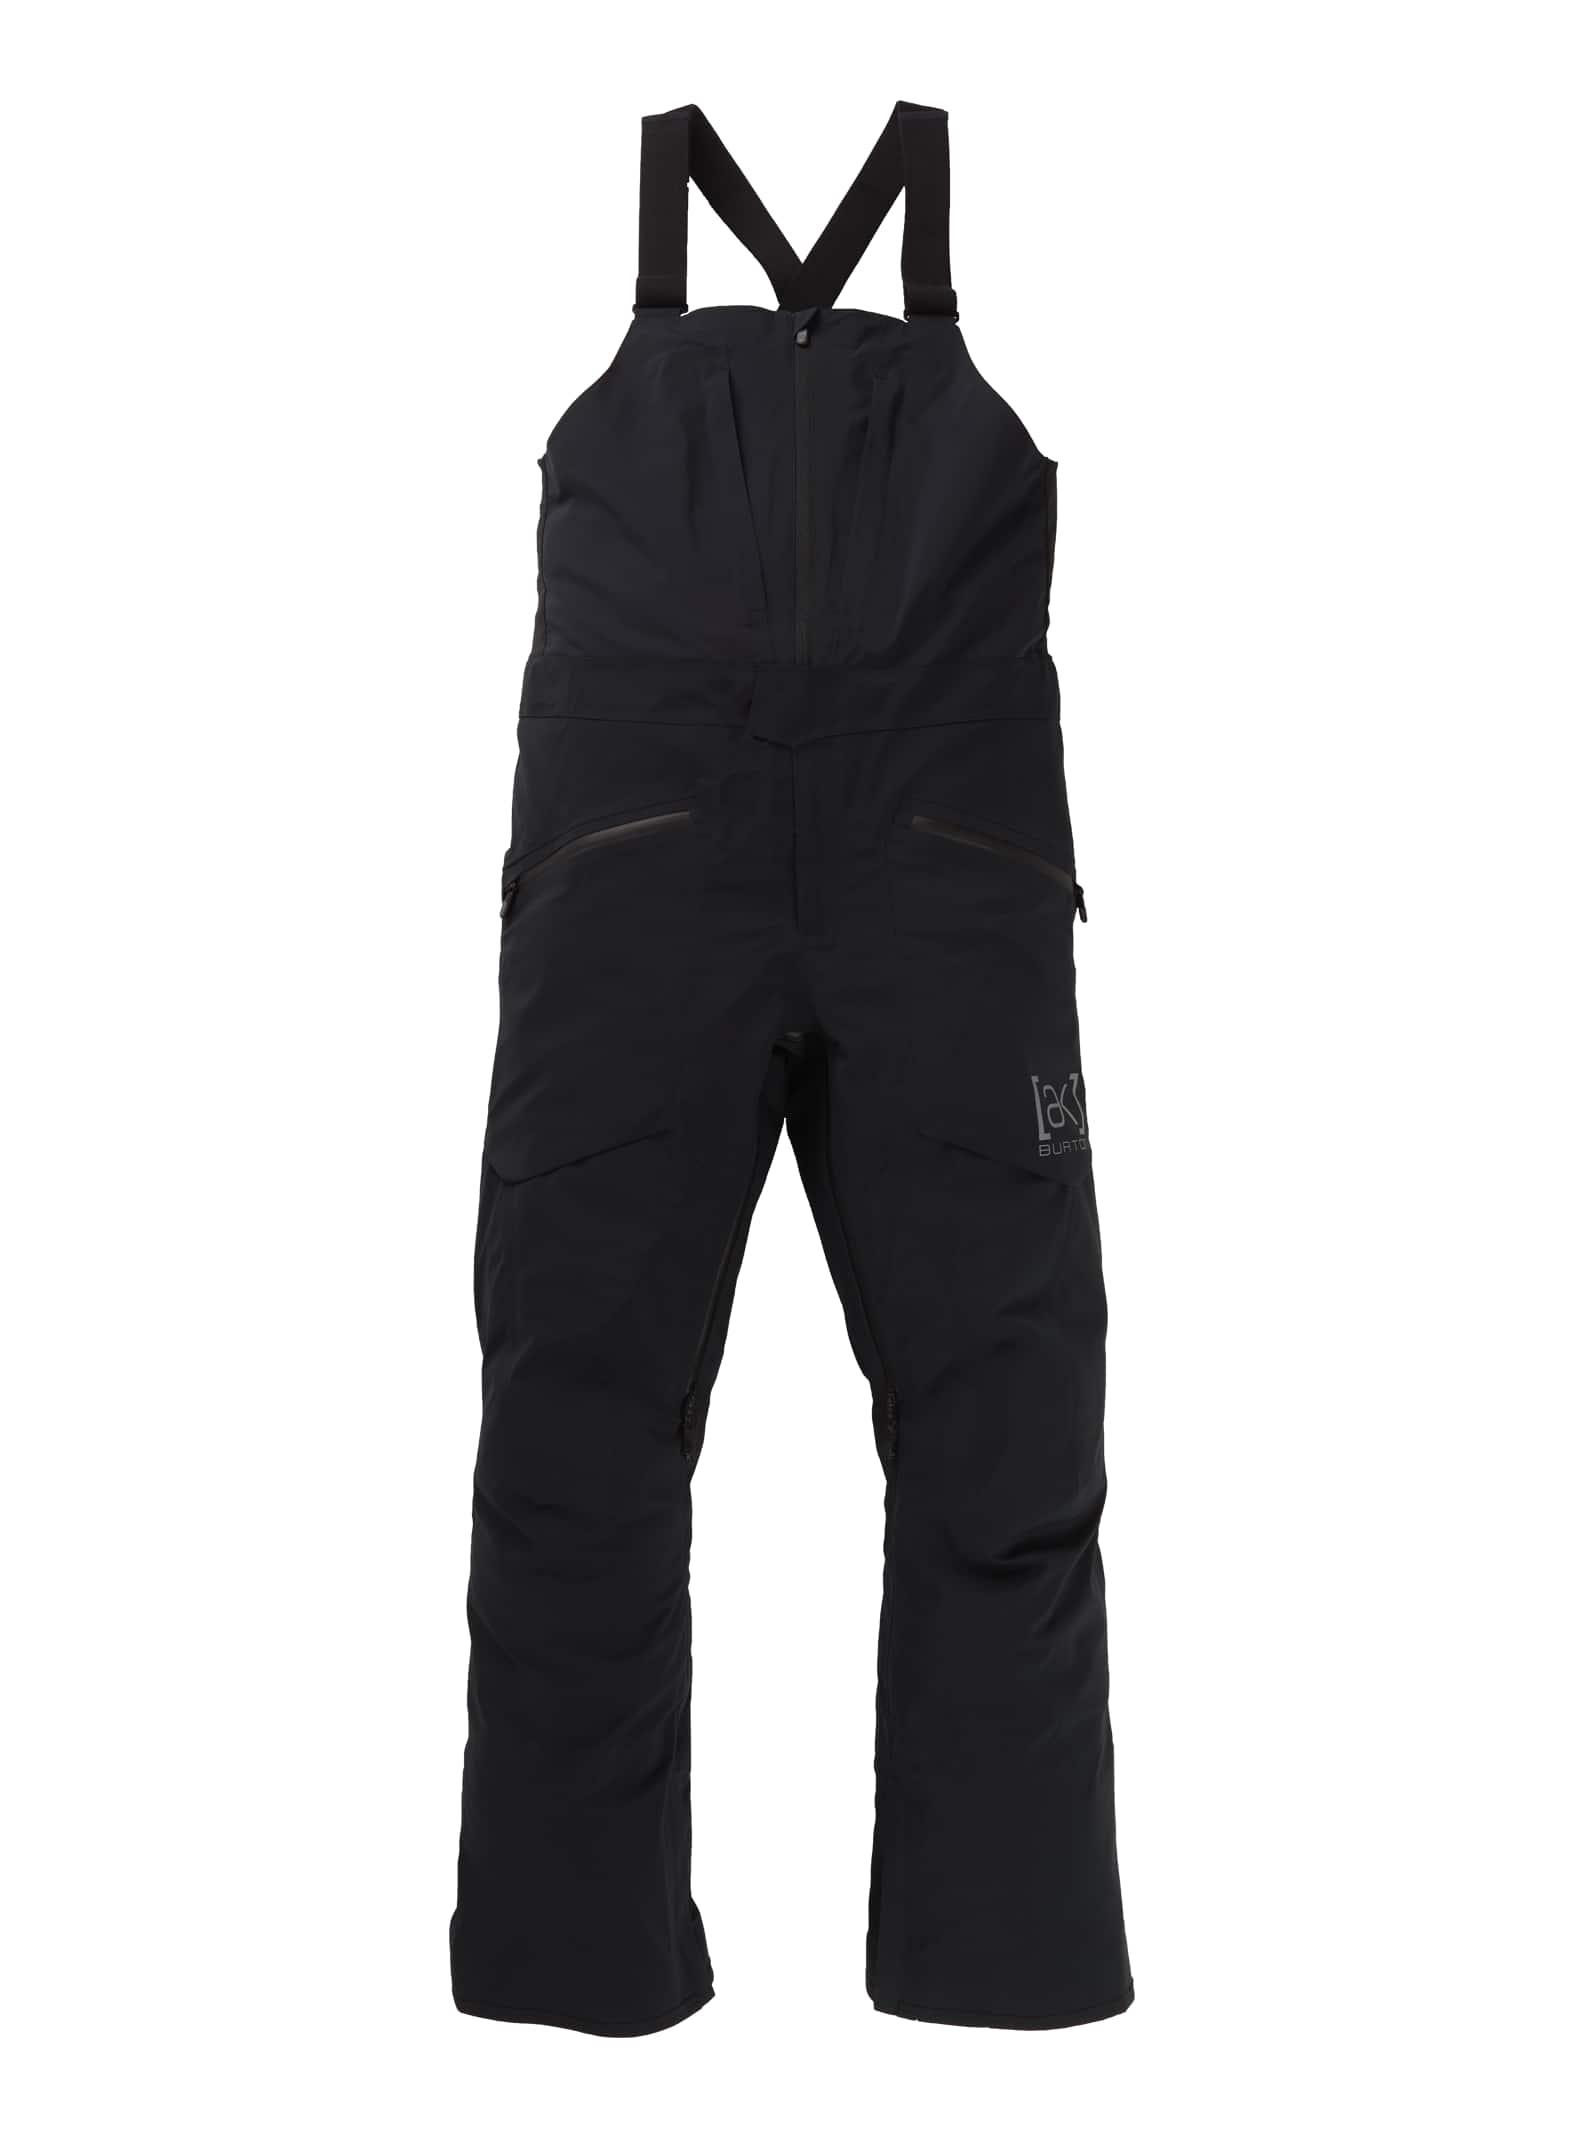 Burton [ak] GORE-TEX 3L Freebird Stretch-skidbyxa för herrar, True Black, XS